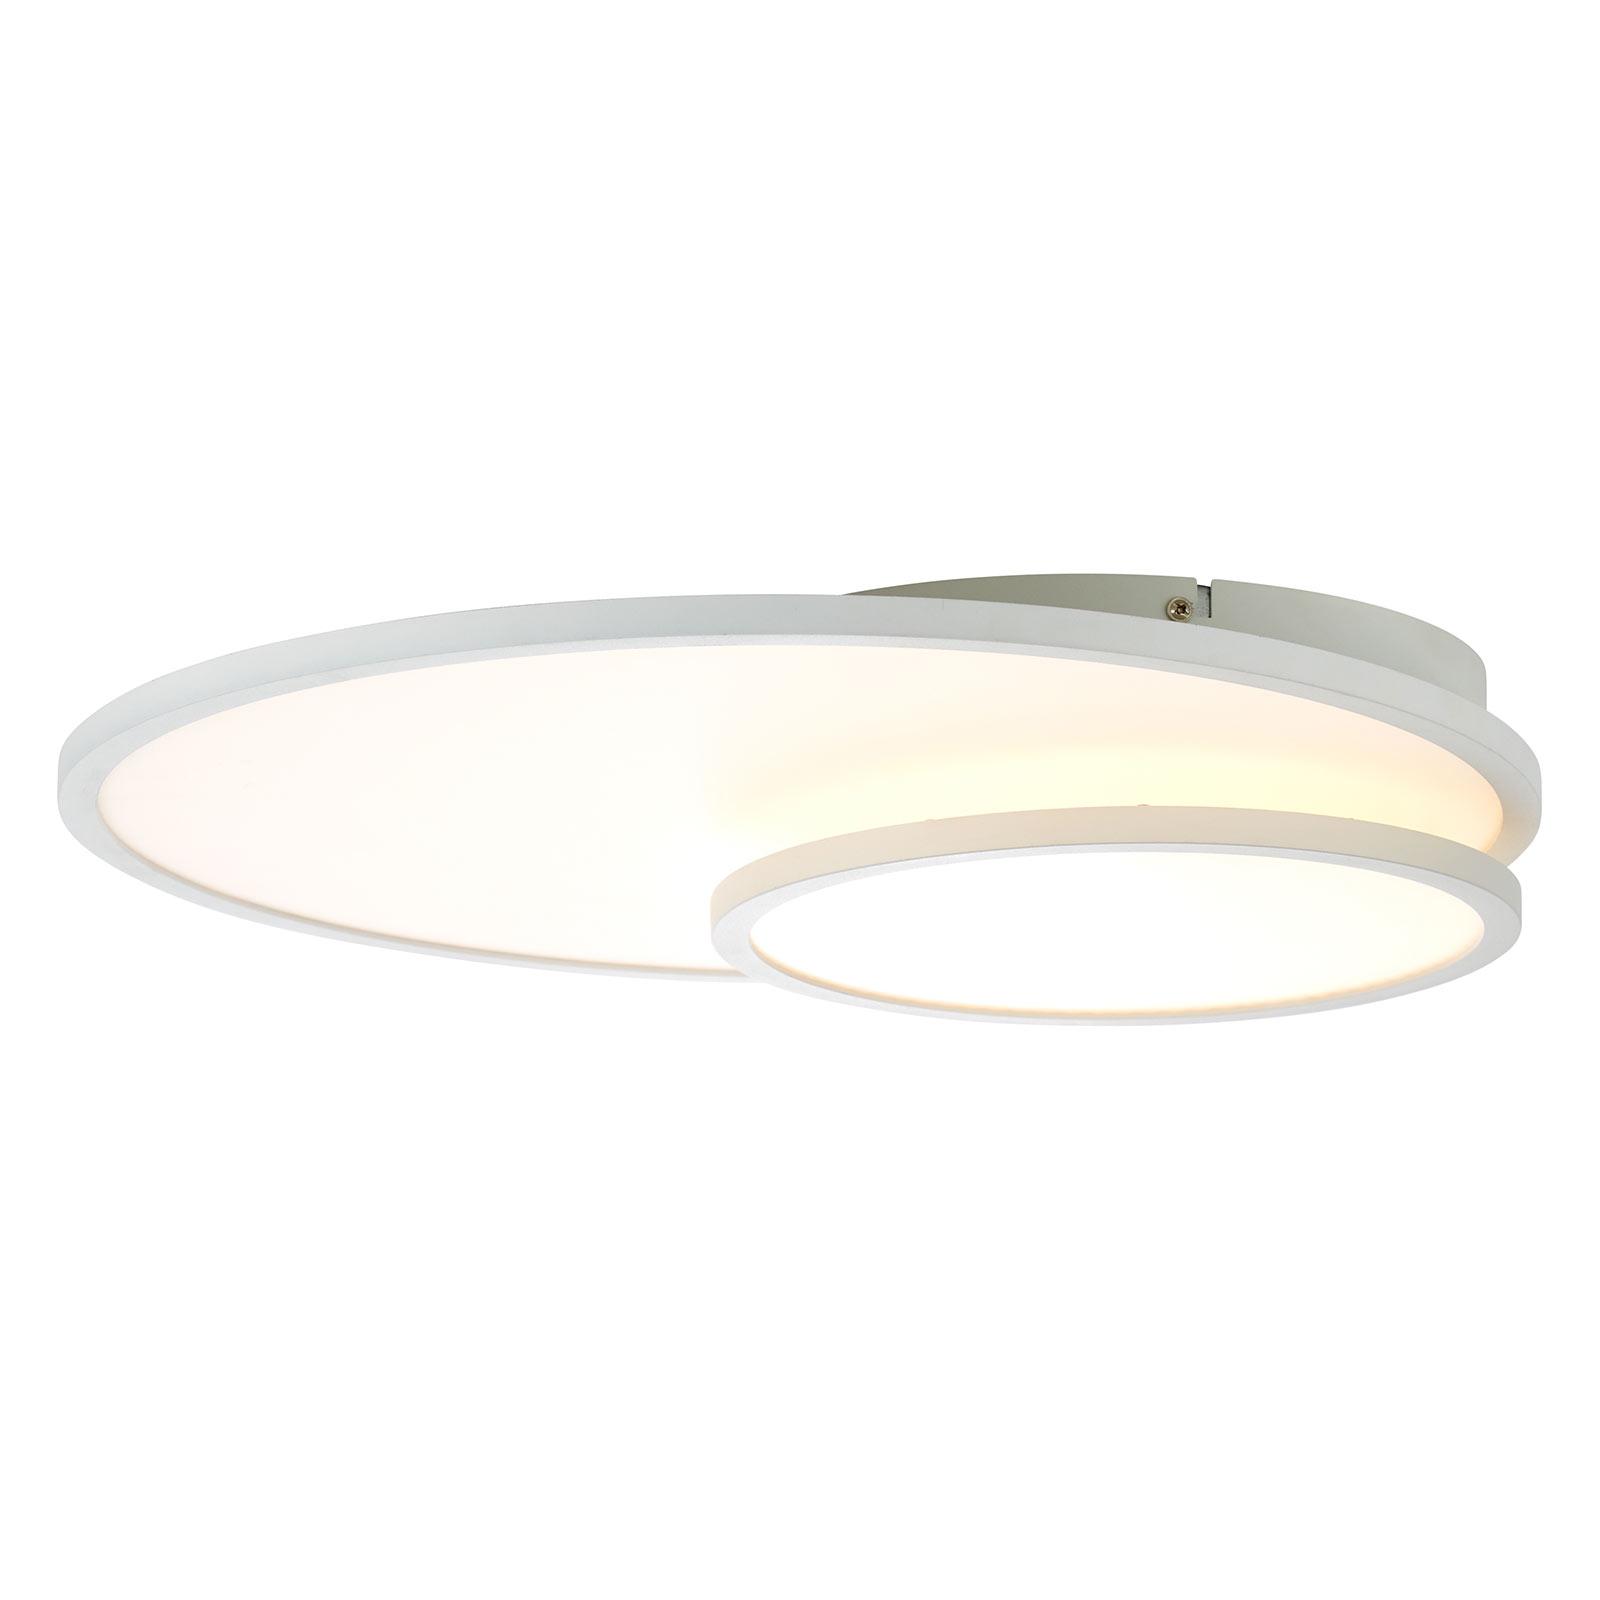 LED-taklampe Bility, rund, hvit ramme